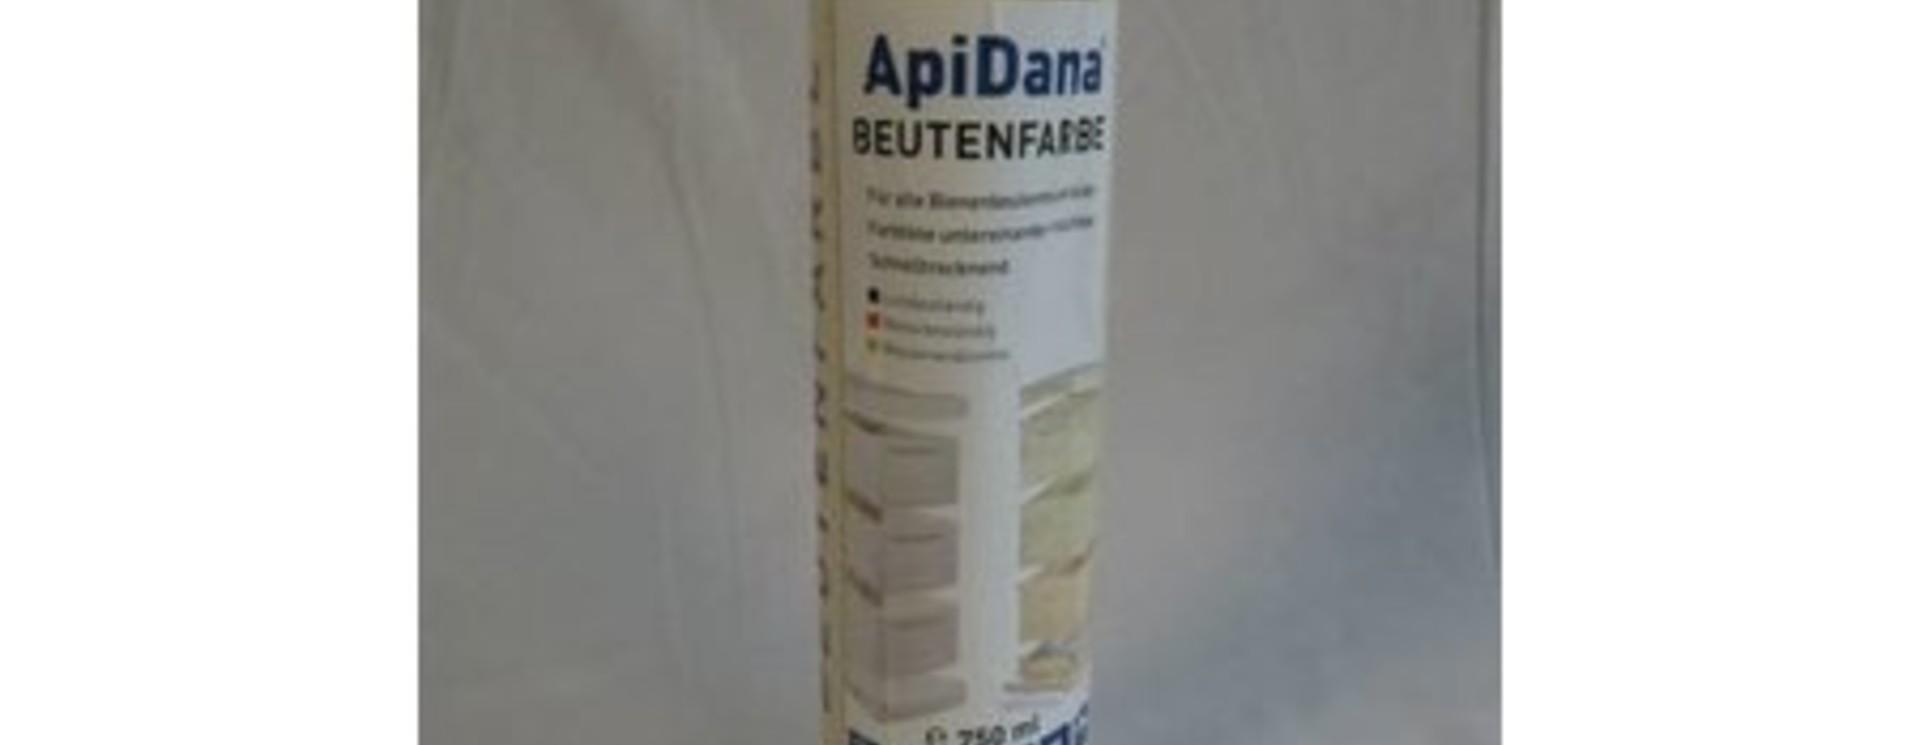 Apidana